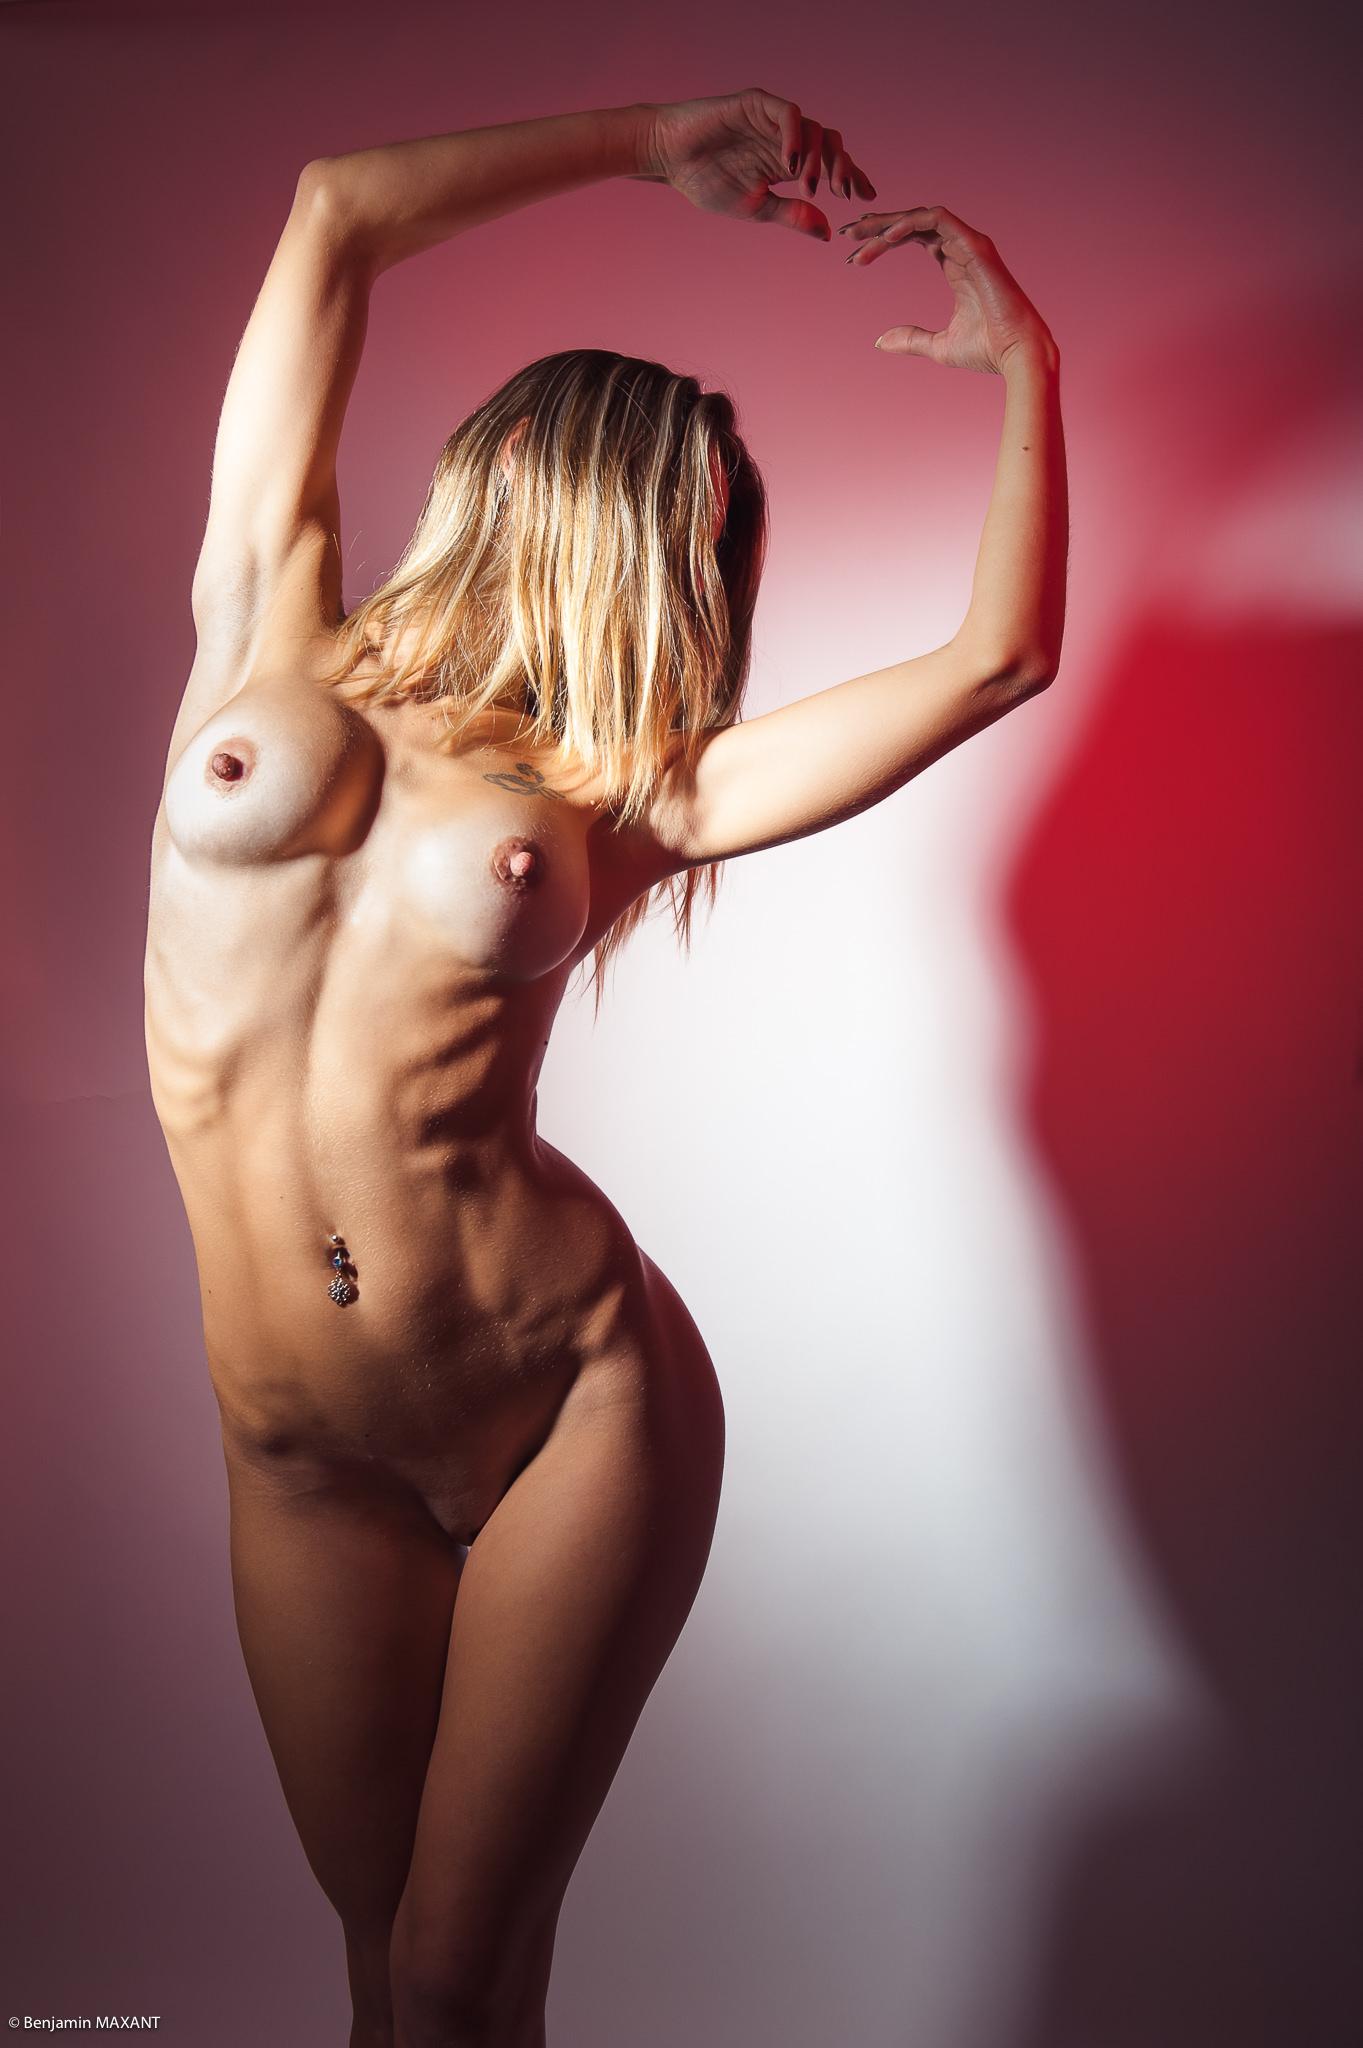 Séance photo nu studio pose danse lumière rouge